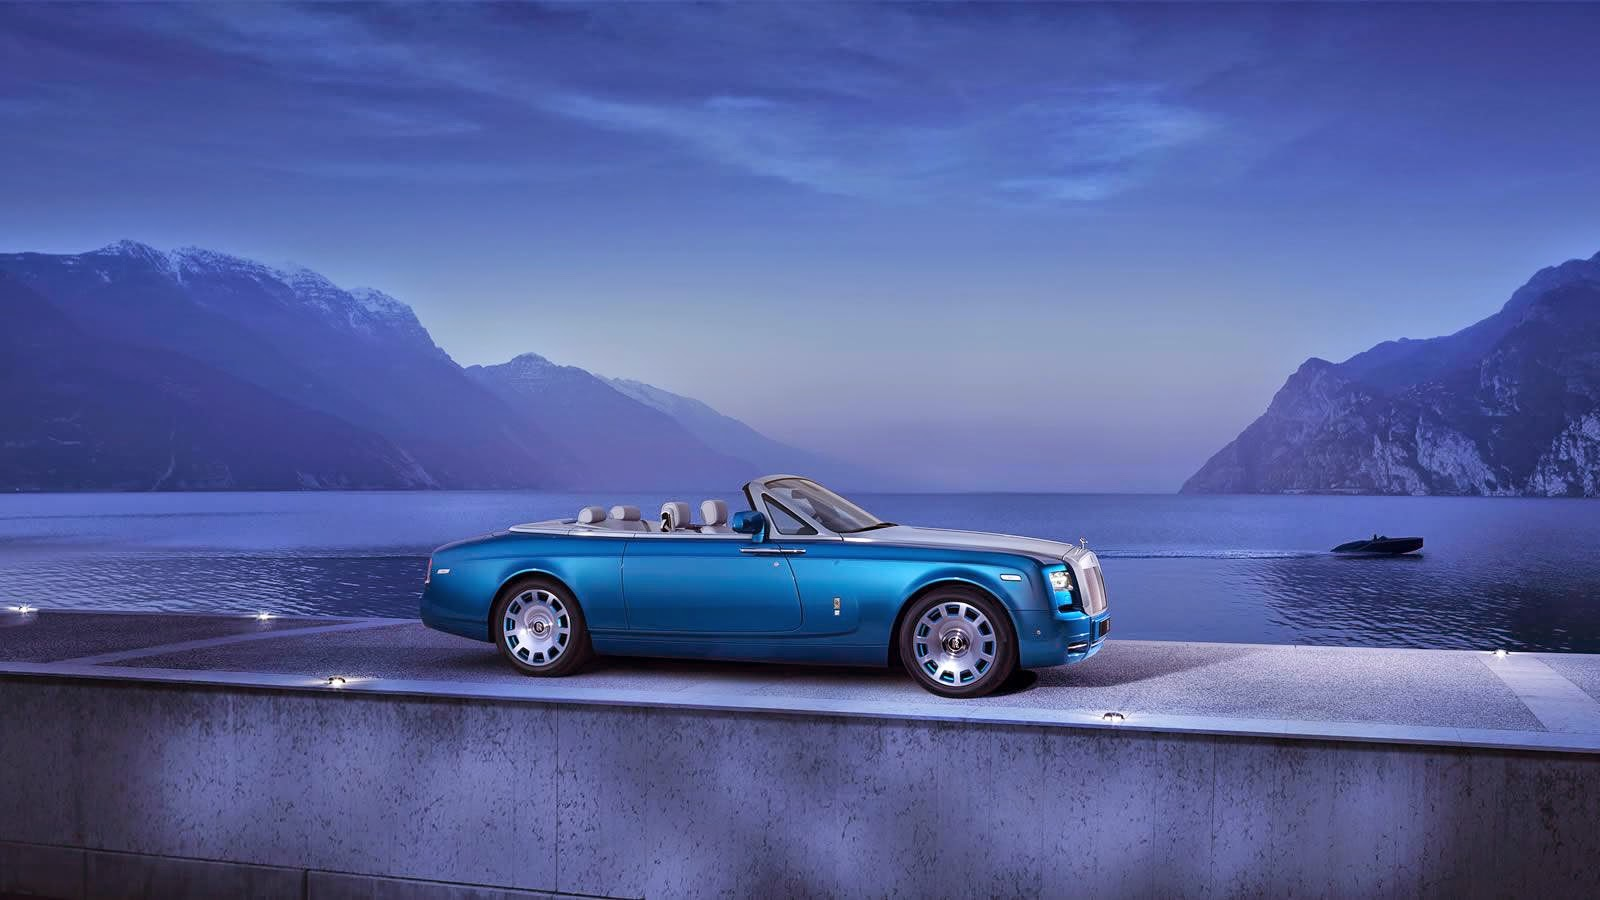 [Resim: Rolls-Royce+Phantom+Drophead+Coup%C3%A9+...tion+1.jpg]